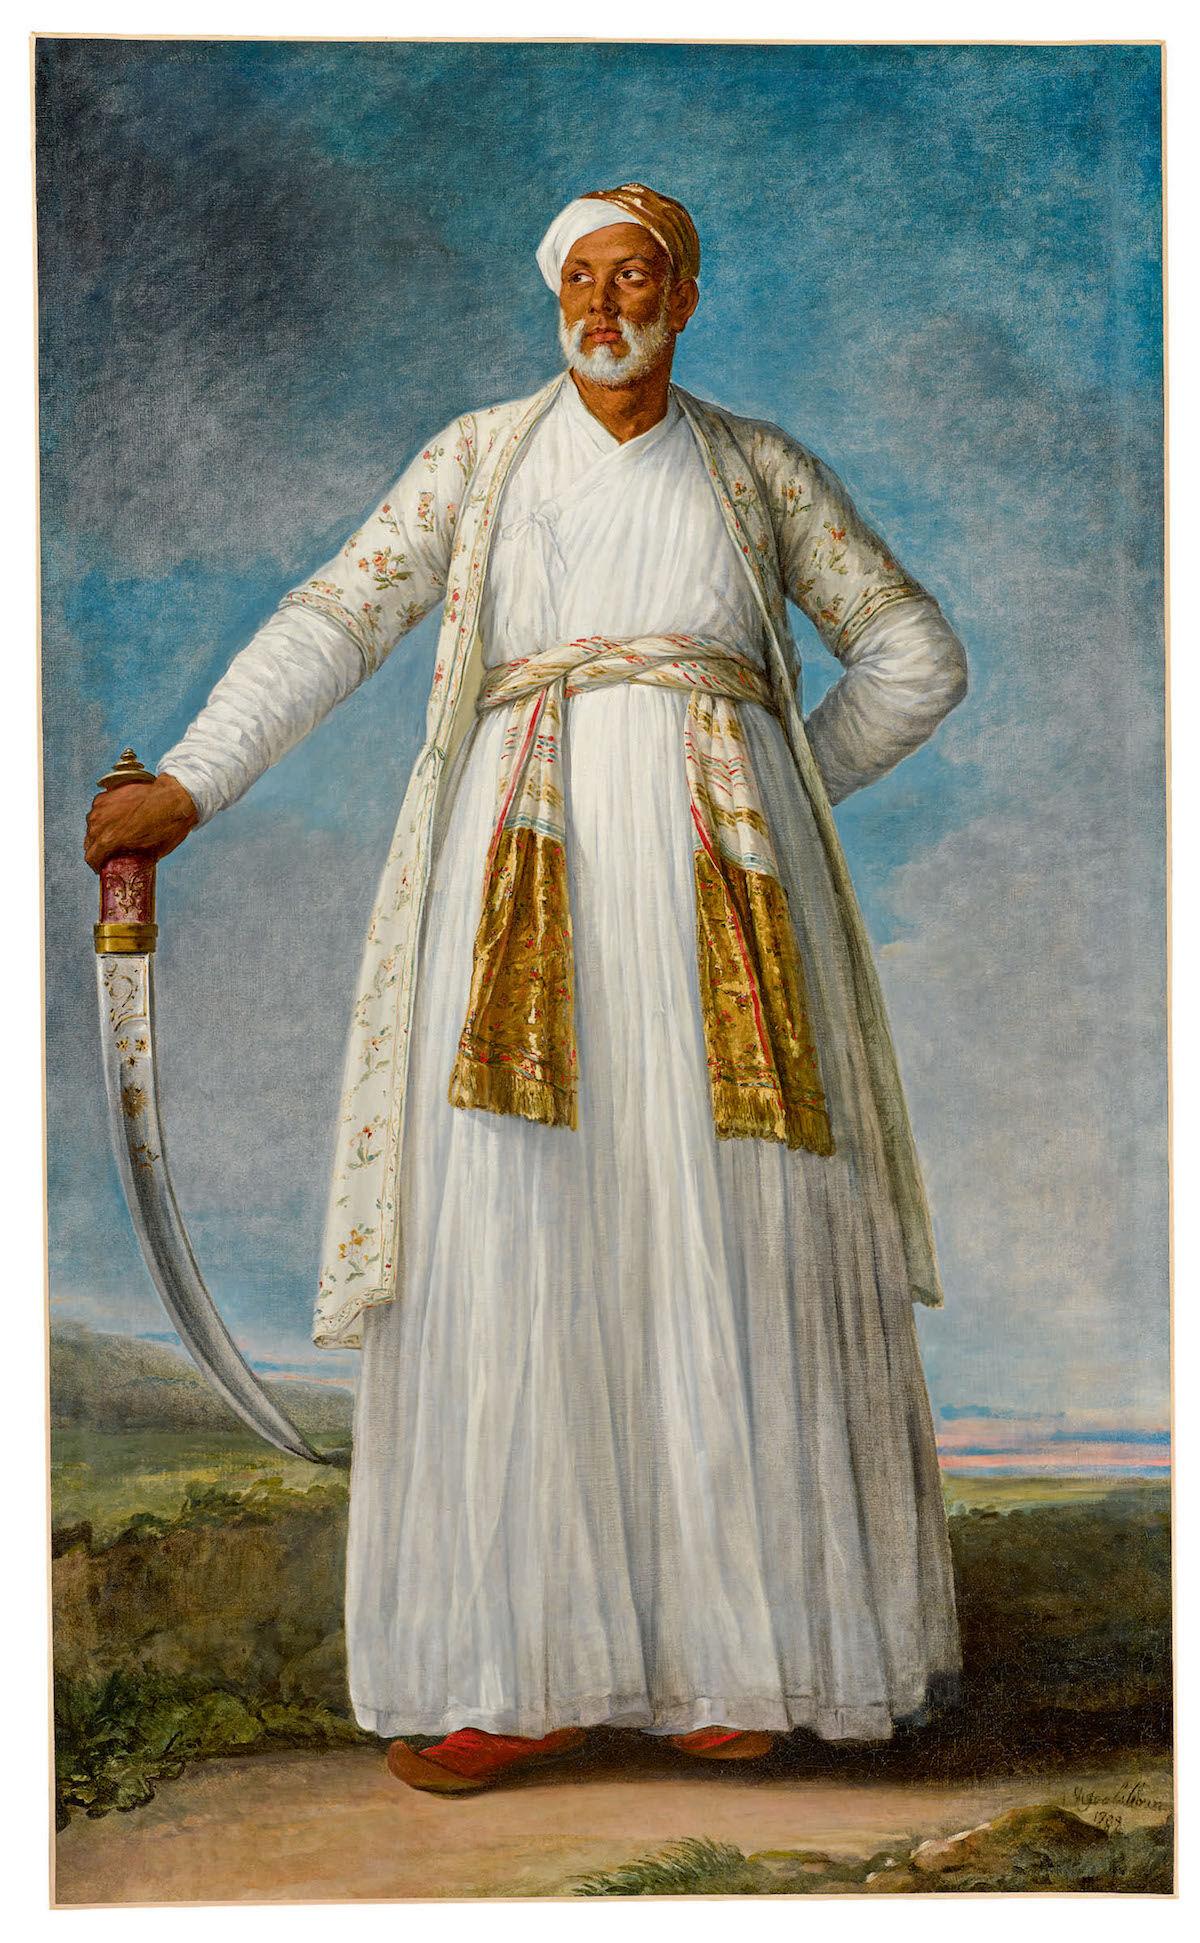 Élisabeth Louise Vigée-Le Brun, Portrait of Muhammad Dervish Khan, Full-Length, Holding His Sword in a Landscape, 1788, oil on canvas. Est. $4–6 million, sold for $7,185,900. Courtesy Sotheby's.